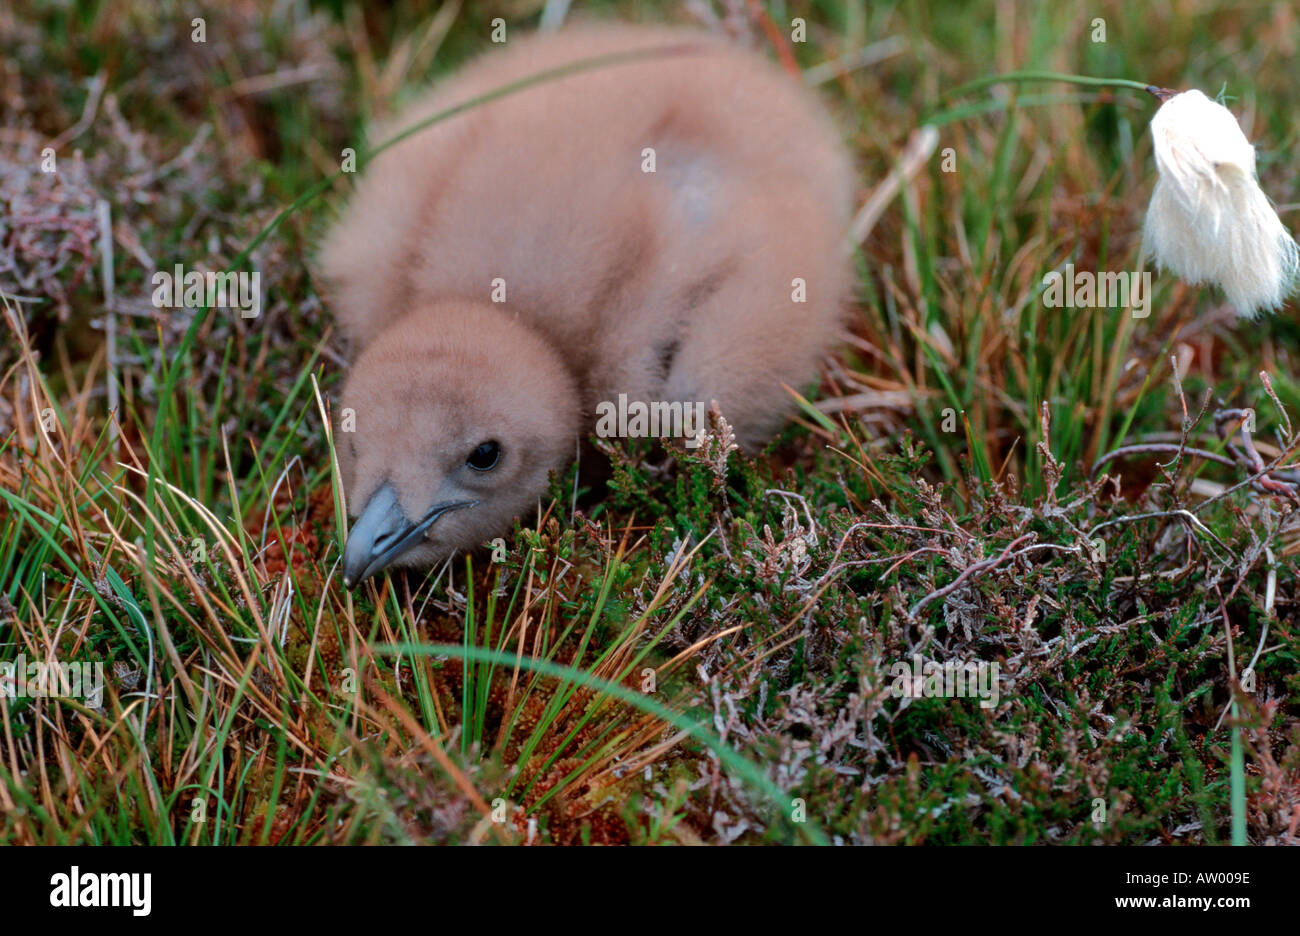 Great Skua chick on the ground in natural nest Hermaness Shetland Islands Scotland UK United Kingdom - Stock Image